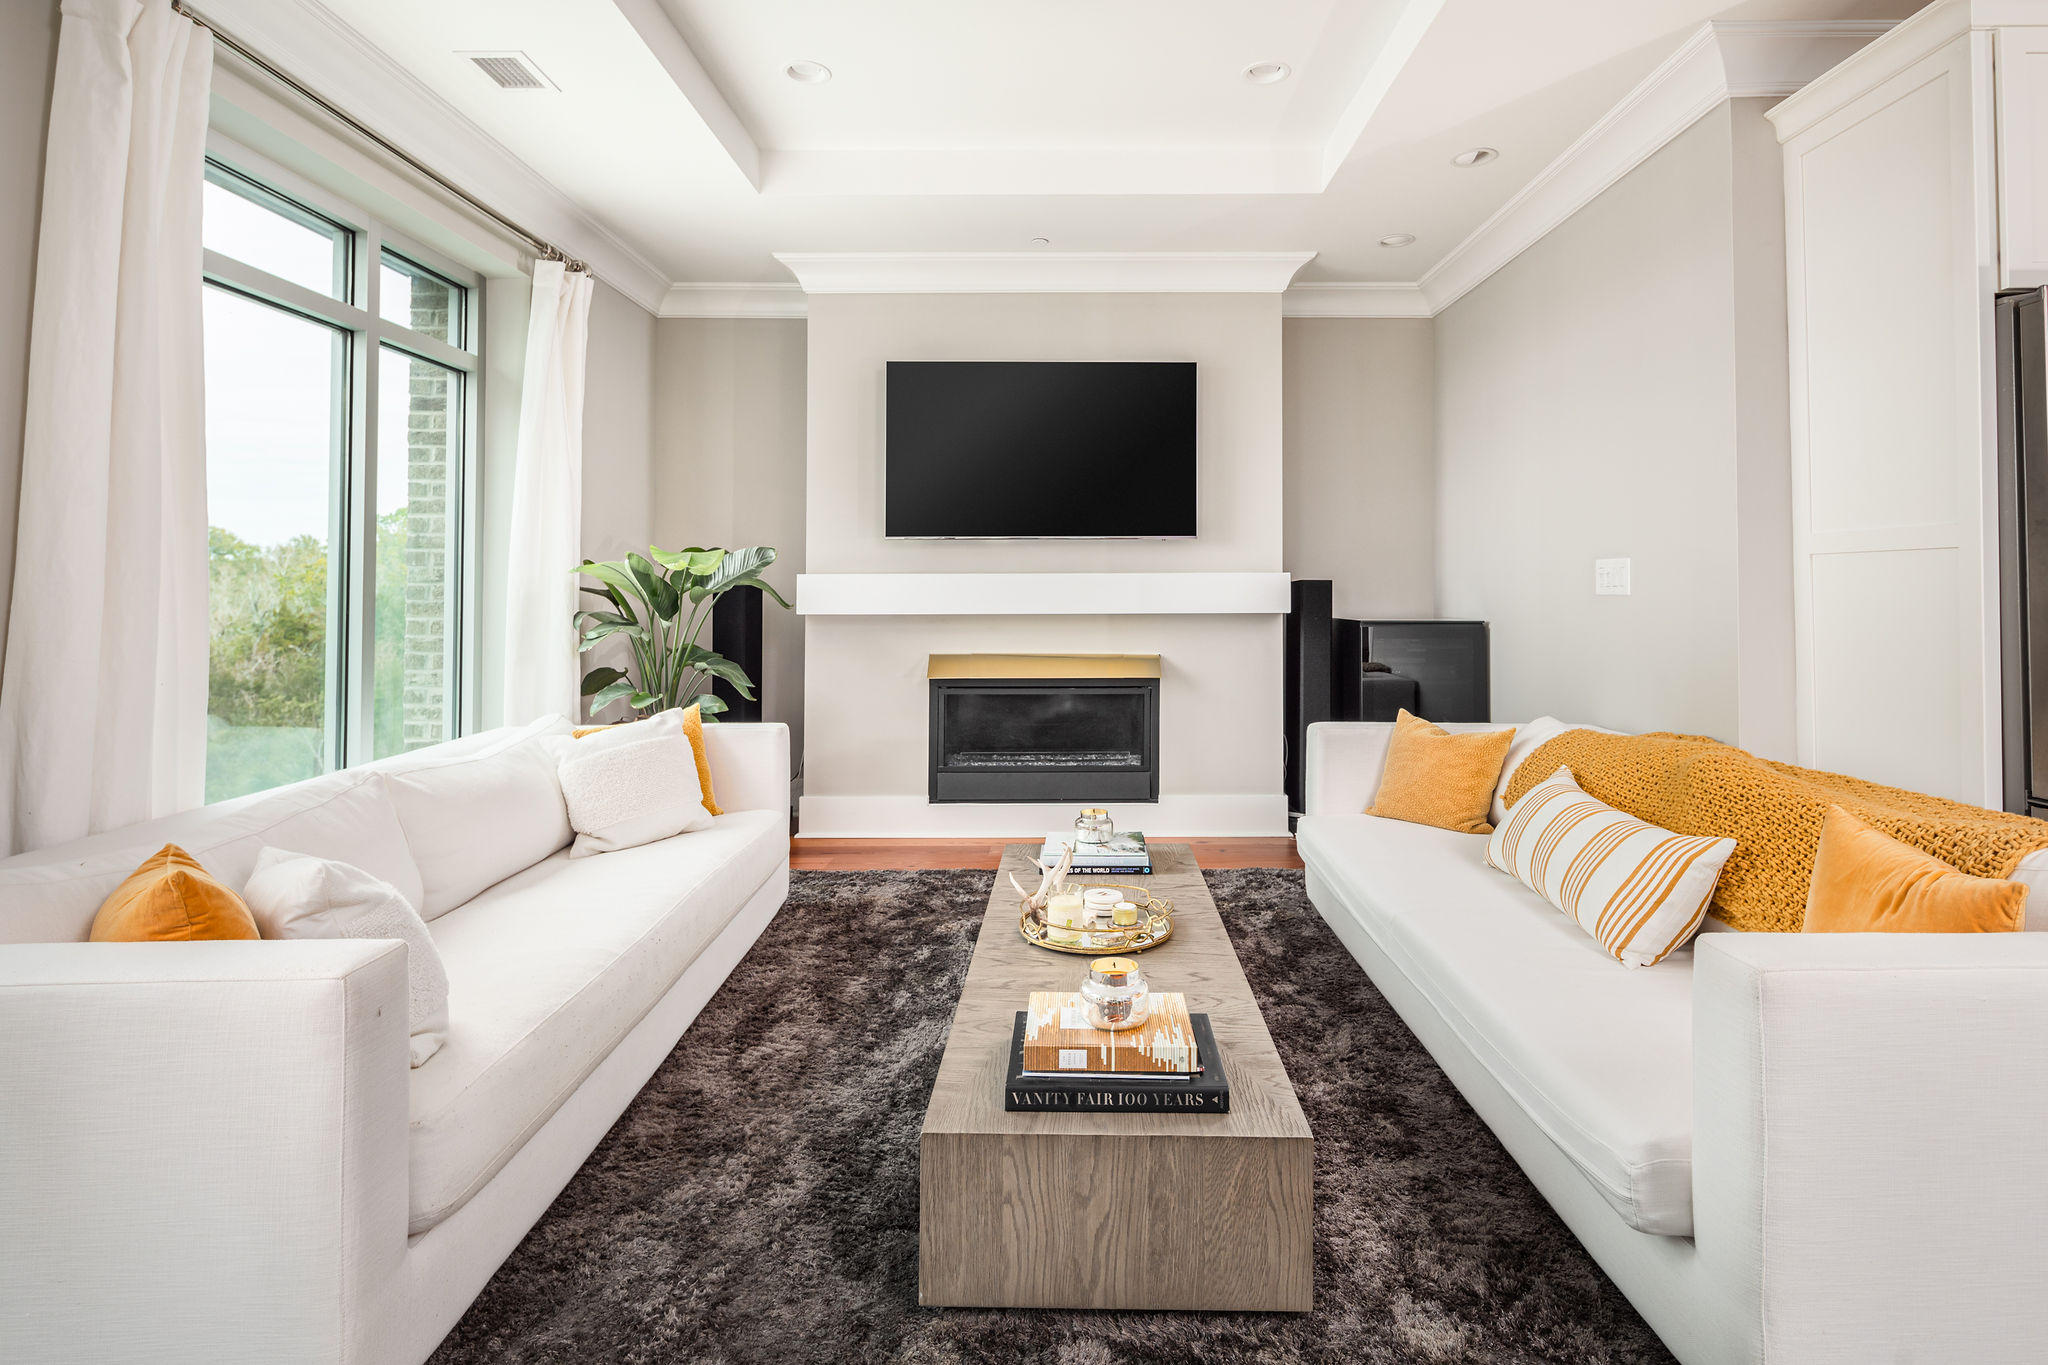 Tides IV Condominiums Homes For Sale - 155 Wingo, Mount Pleasant, SC - 34